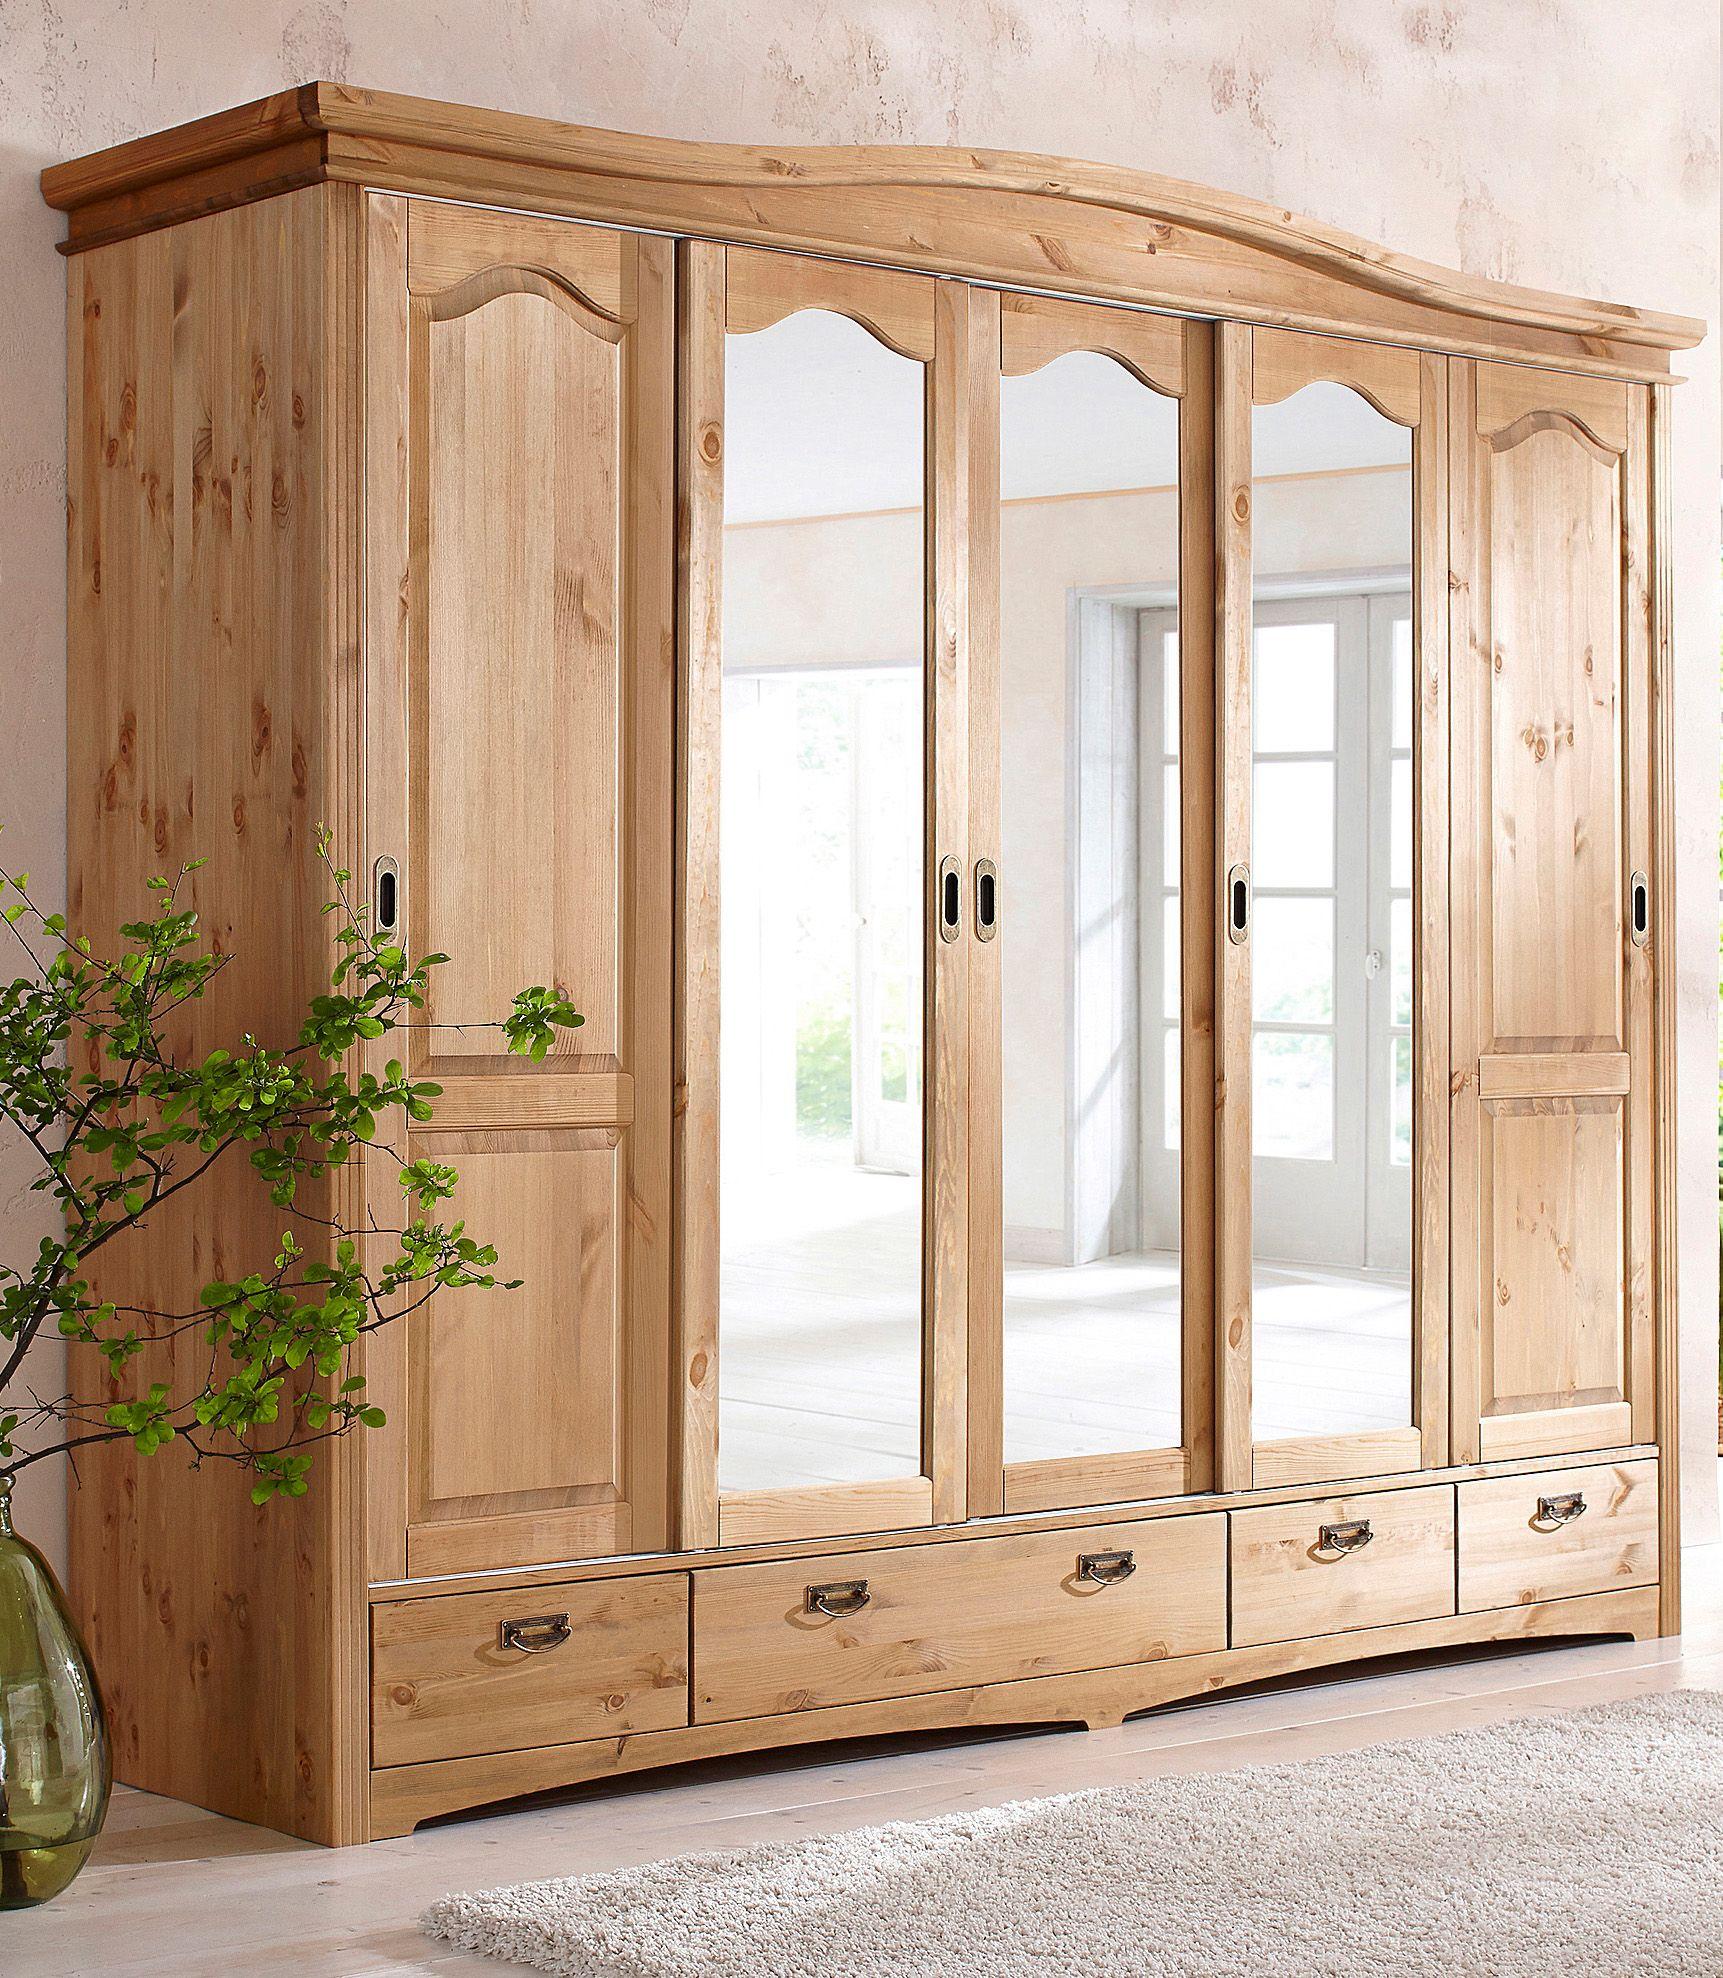 bett schwab versand bettgestelle. Black Bedroom Furniture Sets. Home Design Ideas